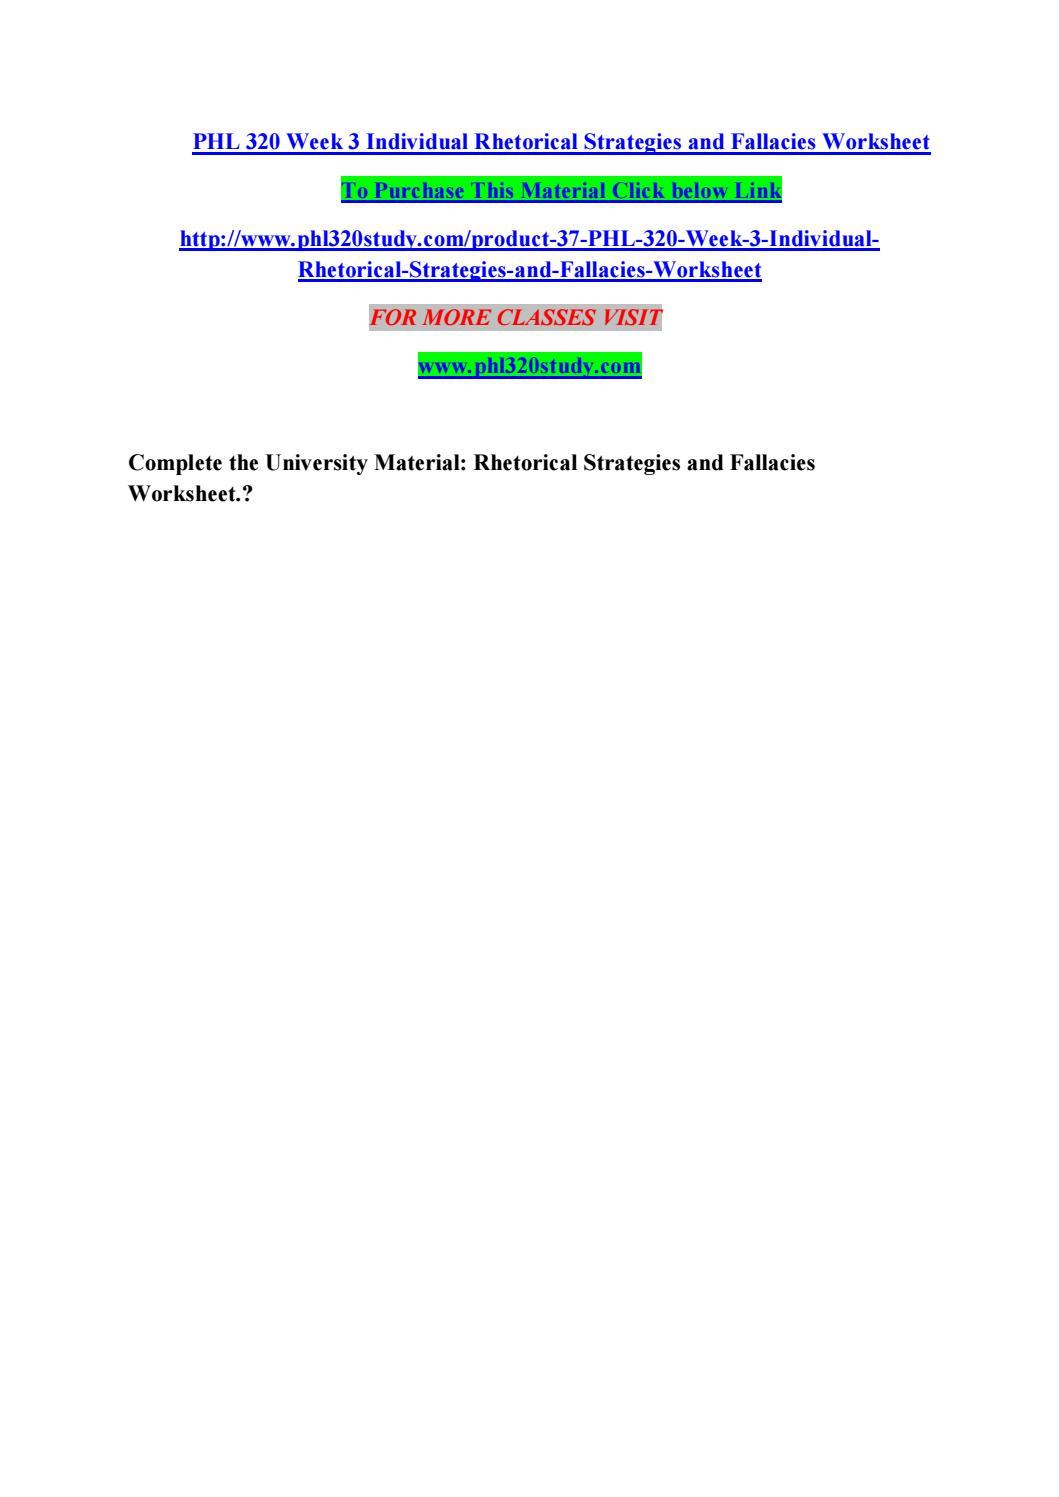 Phl 320 week 3 individual rhetorical strategies and fallacies